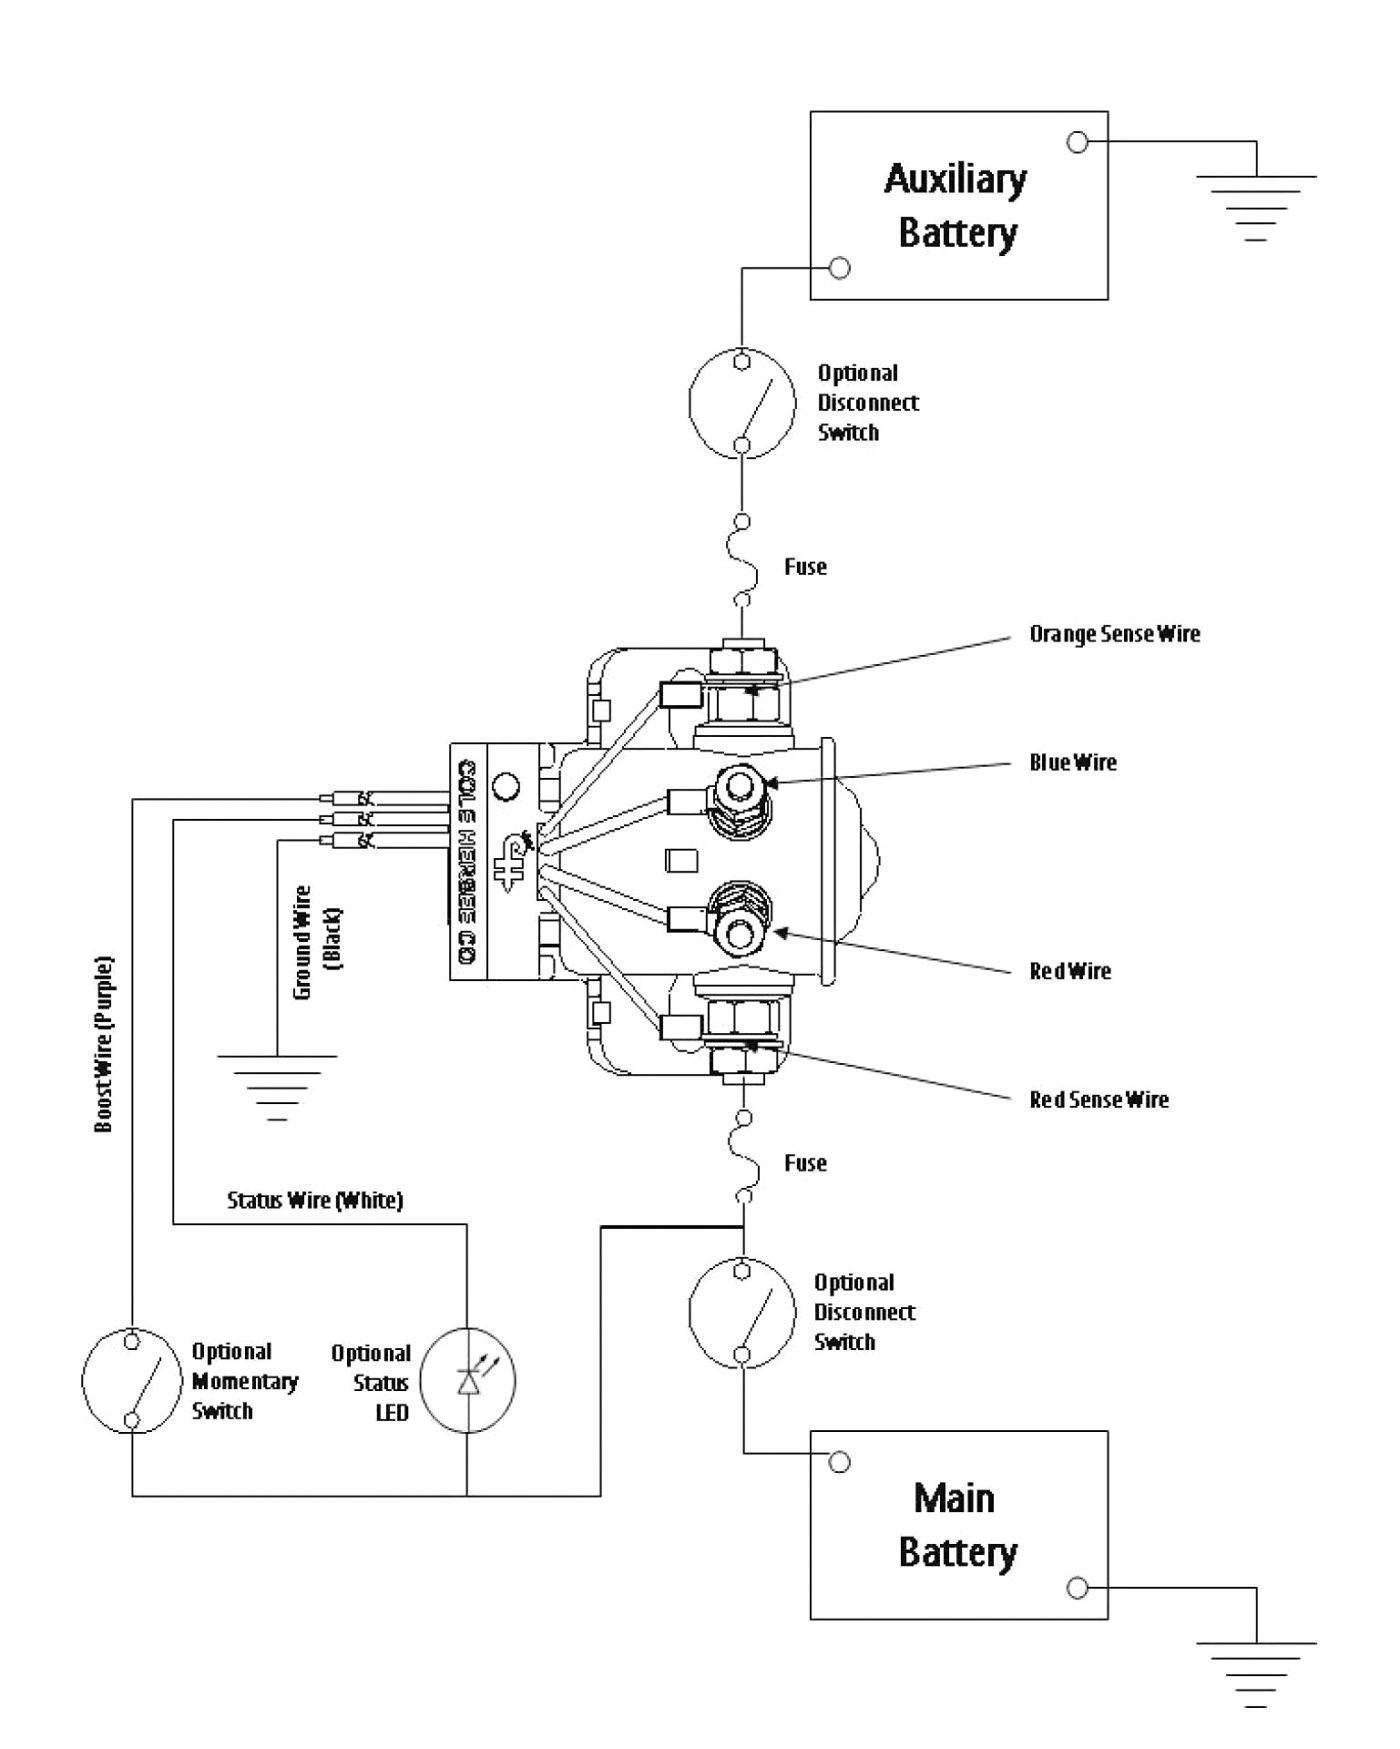 denso alternator wiring diagram free picture